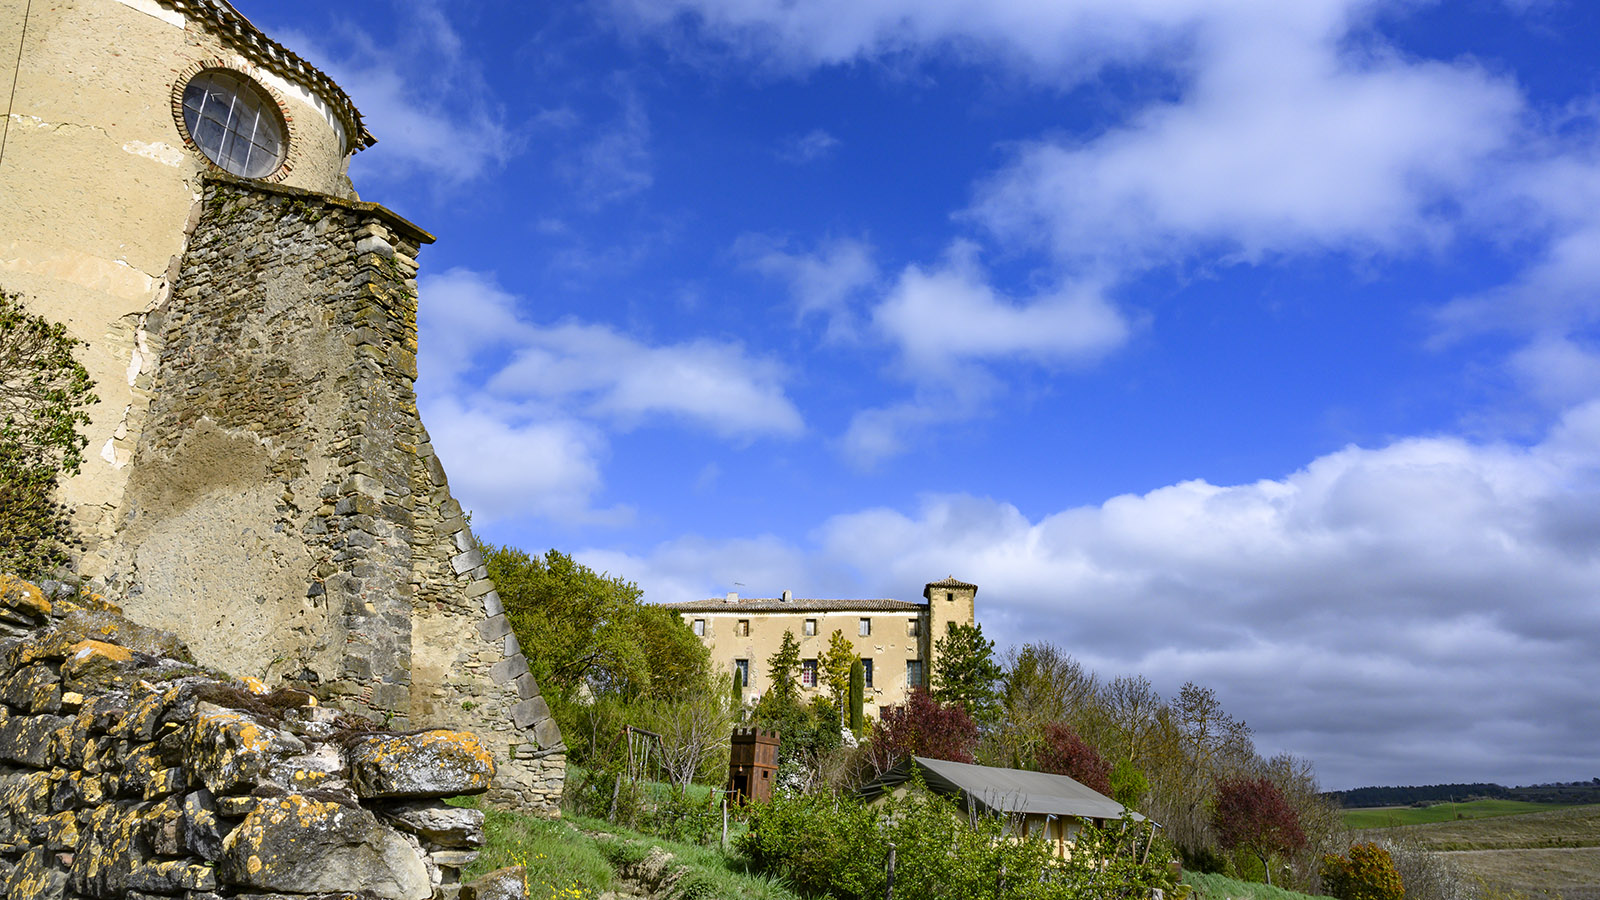 La Serpent: das Schloss - samt Ritterburg davor. Foto: Hilke MaunderHannelore singt vor dem Altar der Église Saint-Étienne. Foto: Hilke Maunder